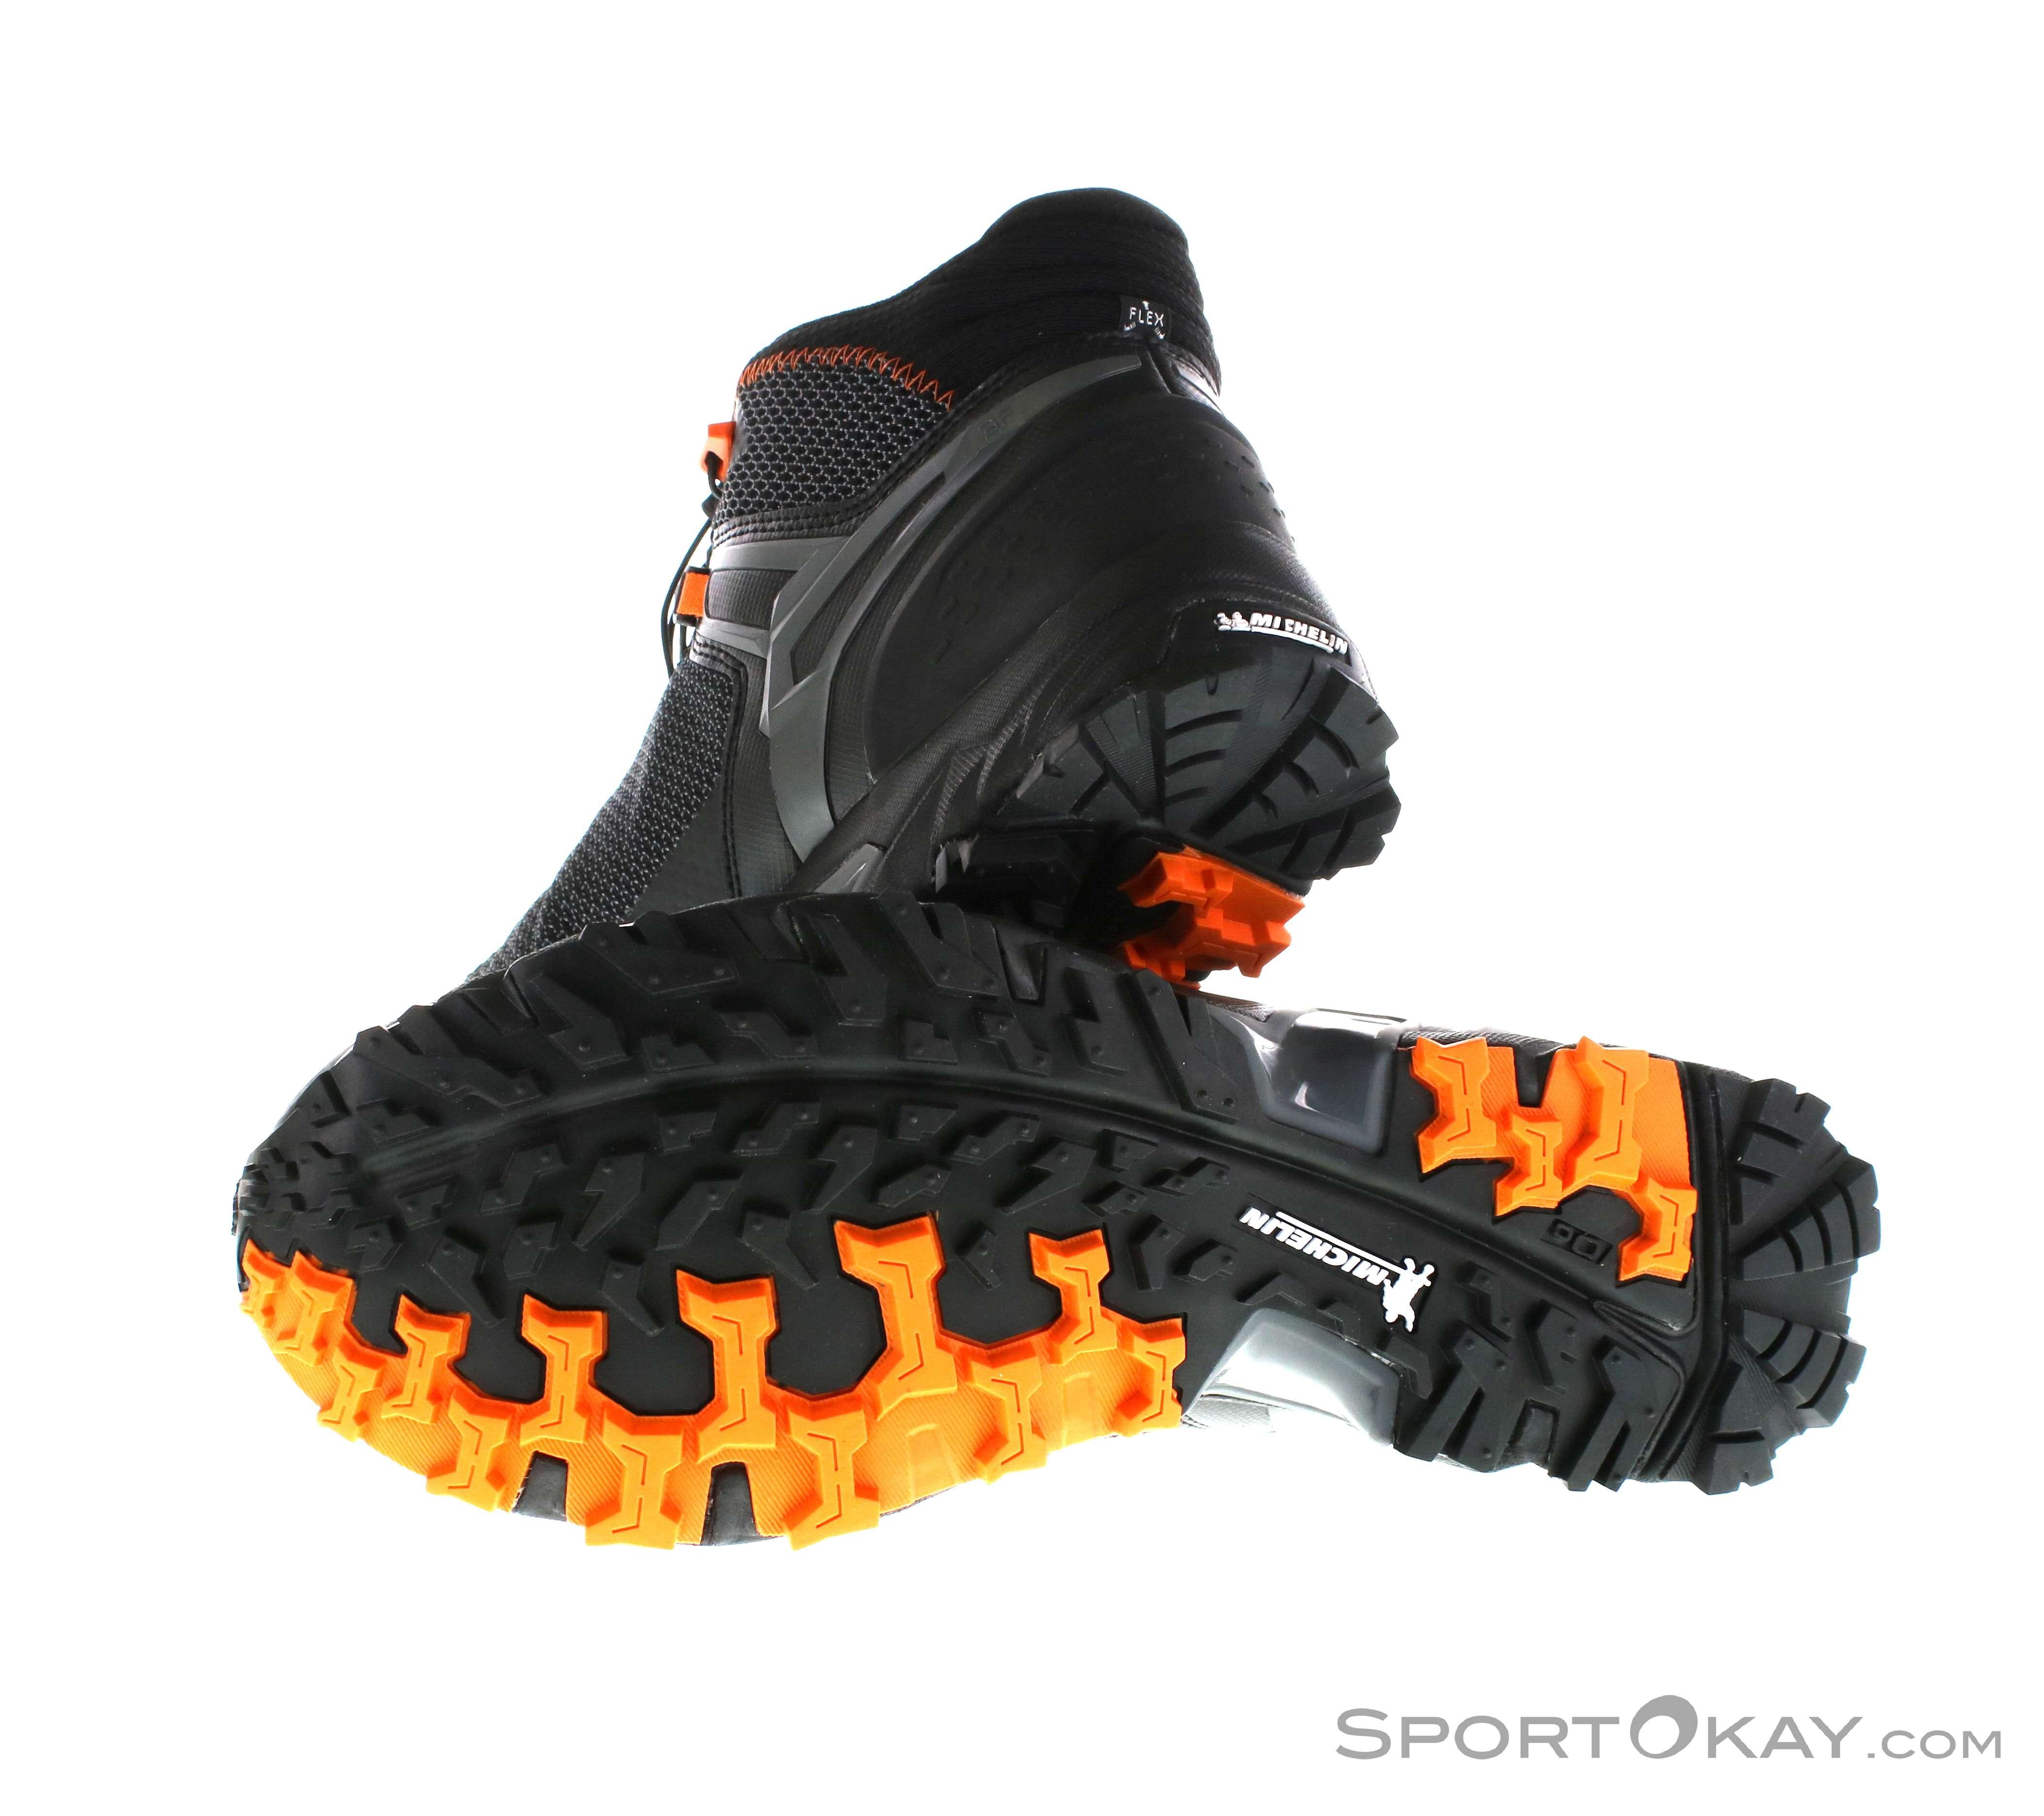 Salewa Ultra Flex Mid GTX Scarpe da Trail Running Gore-Tex - Scarpe ... 574b98ae70b